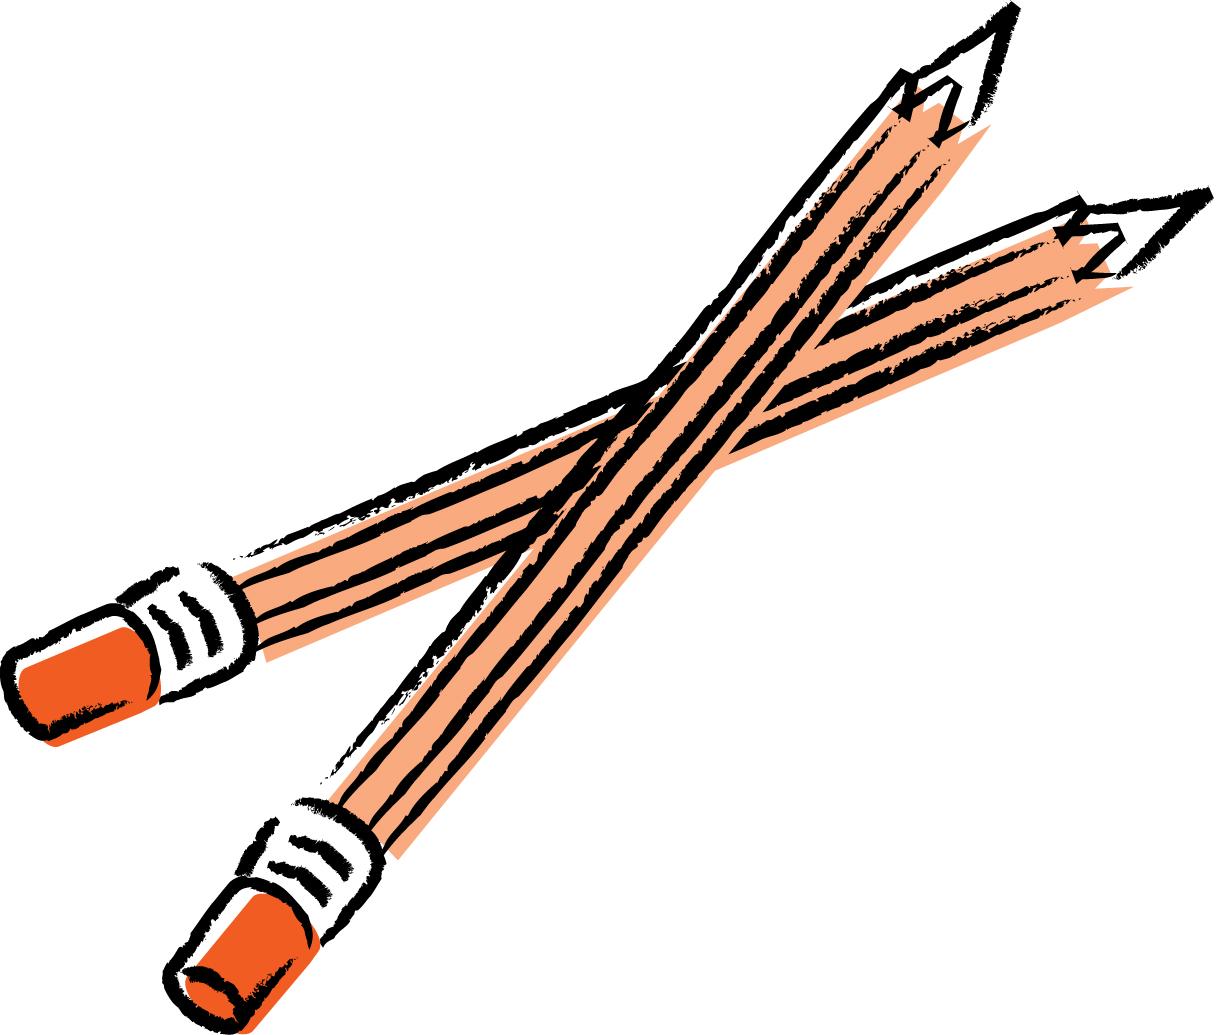 Pencil clip art free clipart images 8